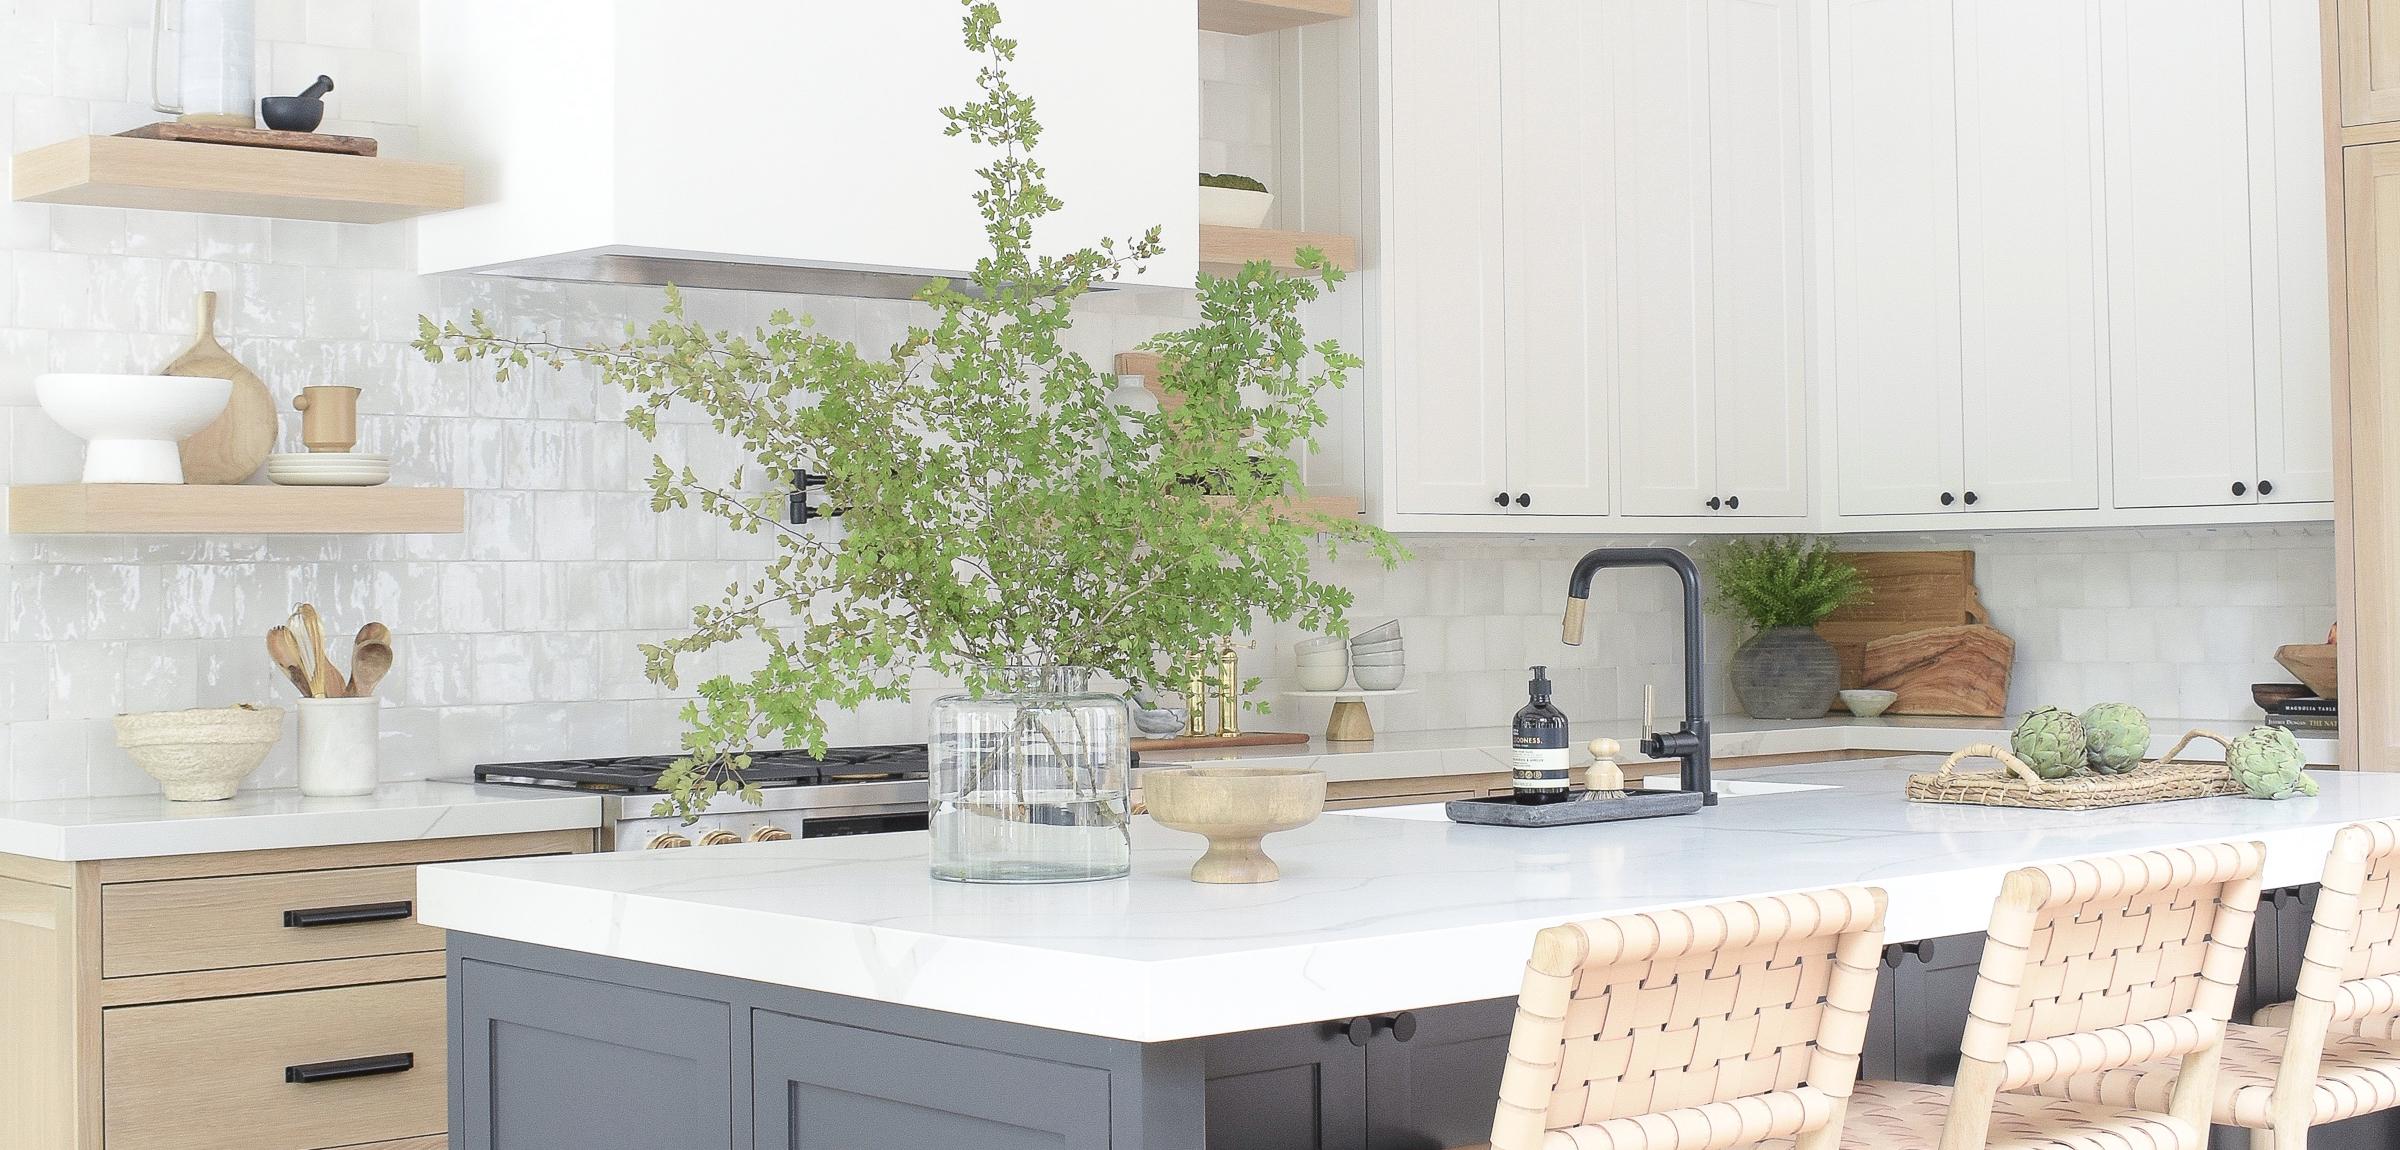 zdesignathome-kitchen-three-cabinet-colors-white-oak-sw-snowbound-iron-ore-black-island-quartz-countertops-modern-farmhouse-1